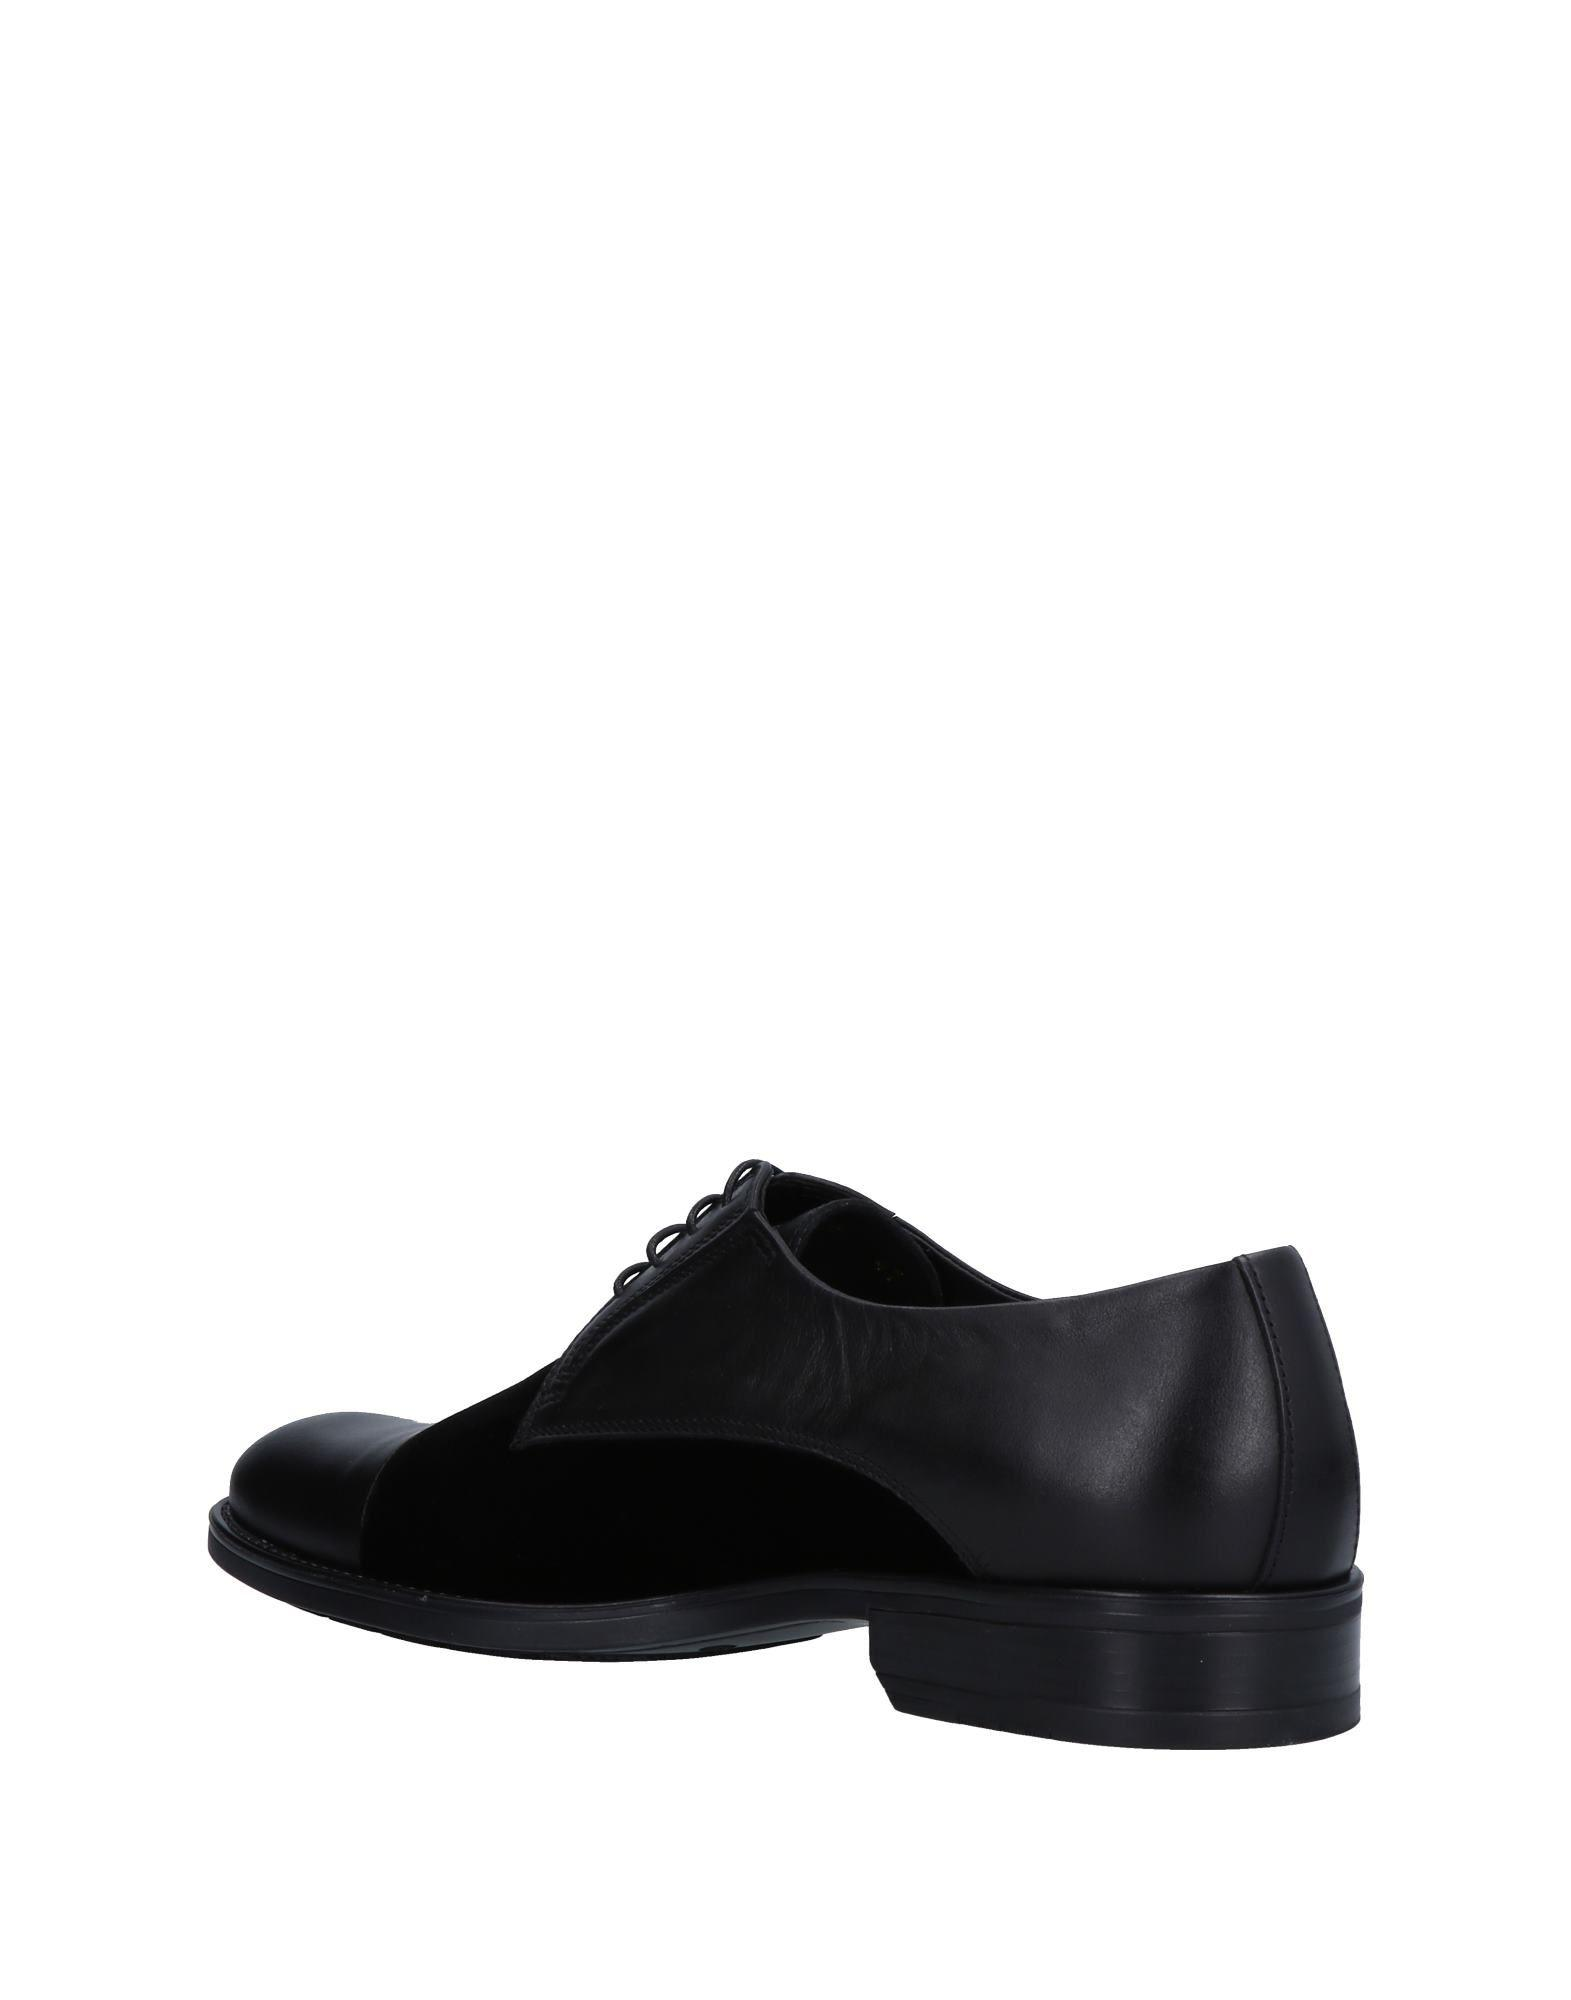 Gianfranco Lattanzi Velvet Lace-up Shoe in Black for Men